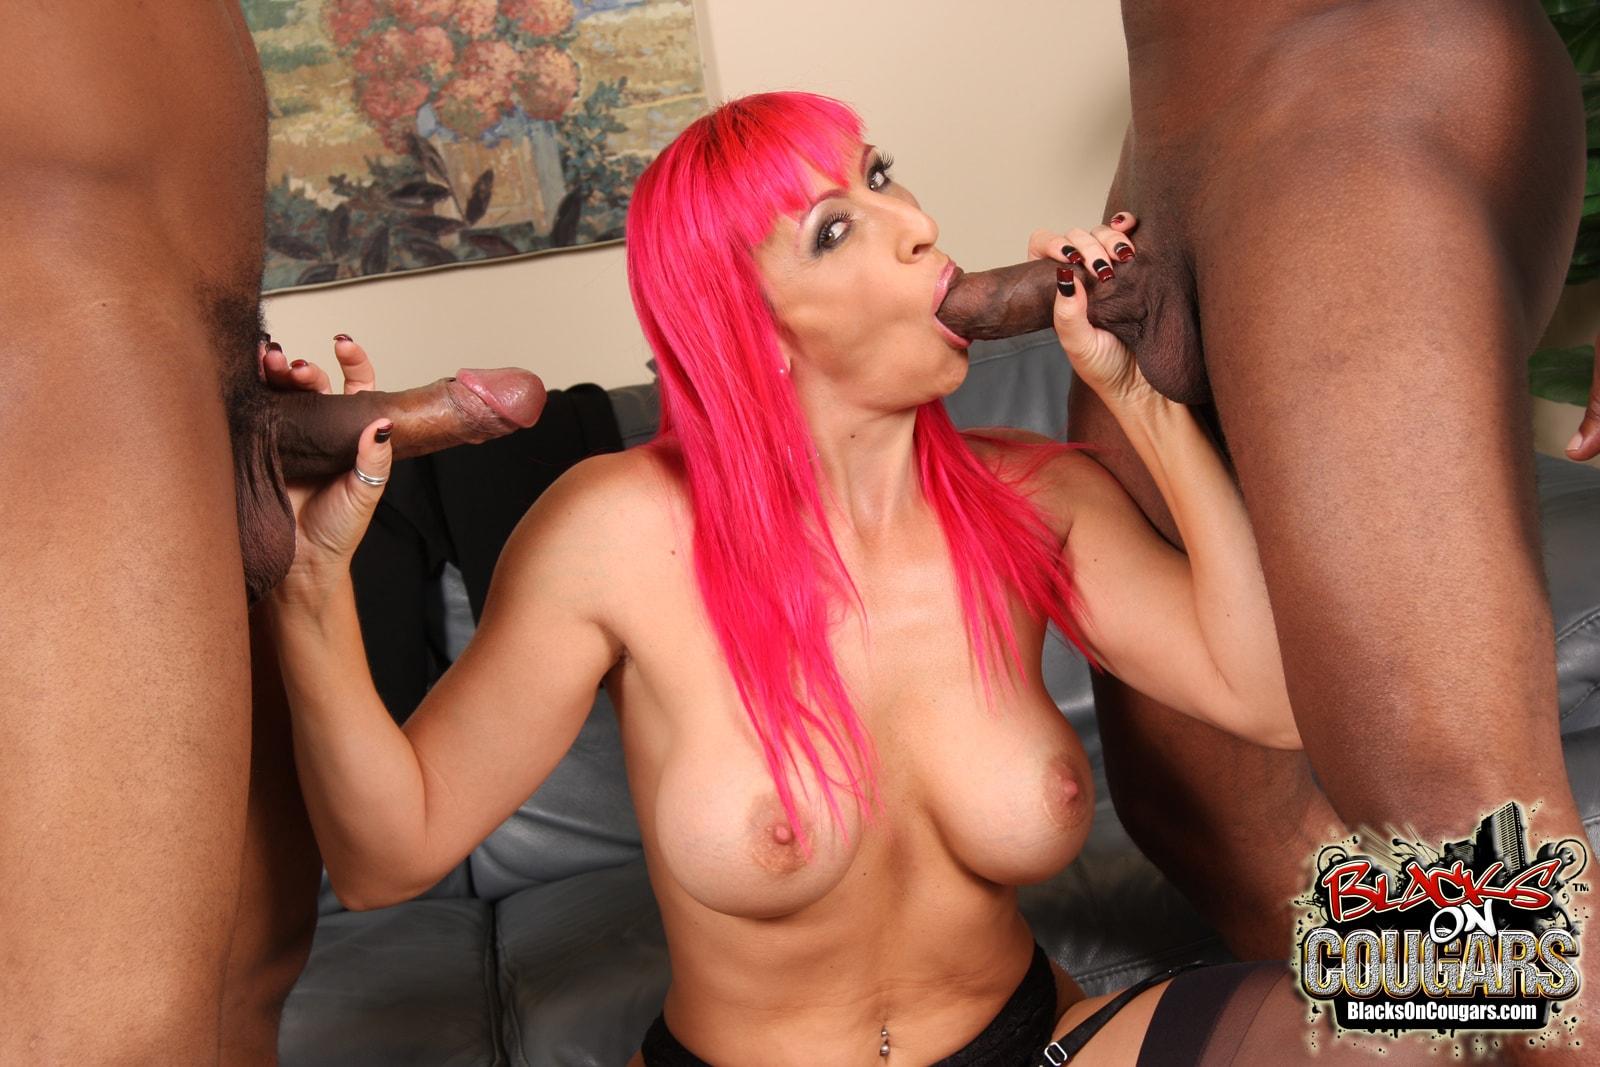 Dogfart '- Blacks On Cougars' starring Raven Black (Photo 12)